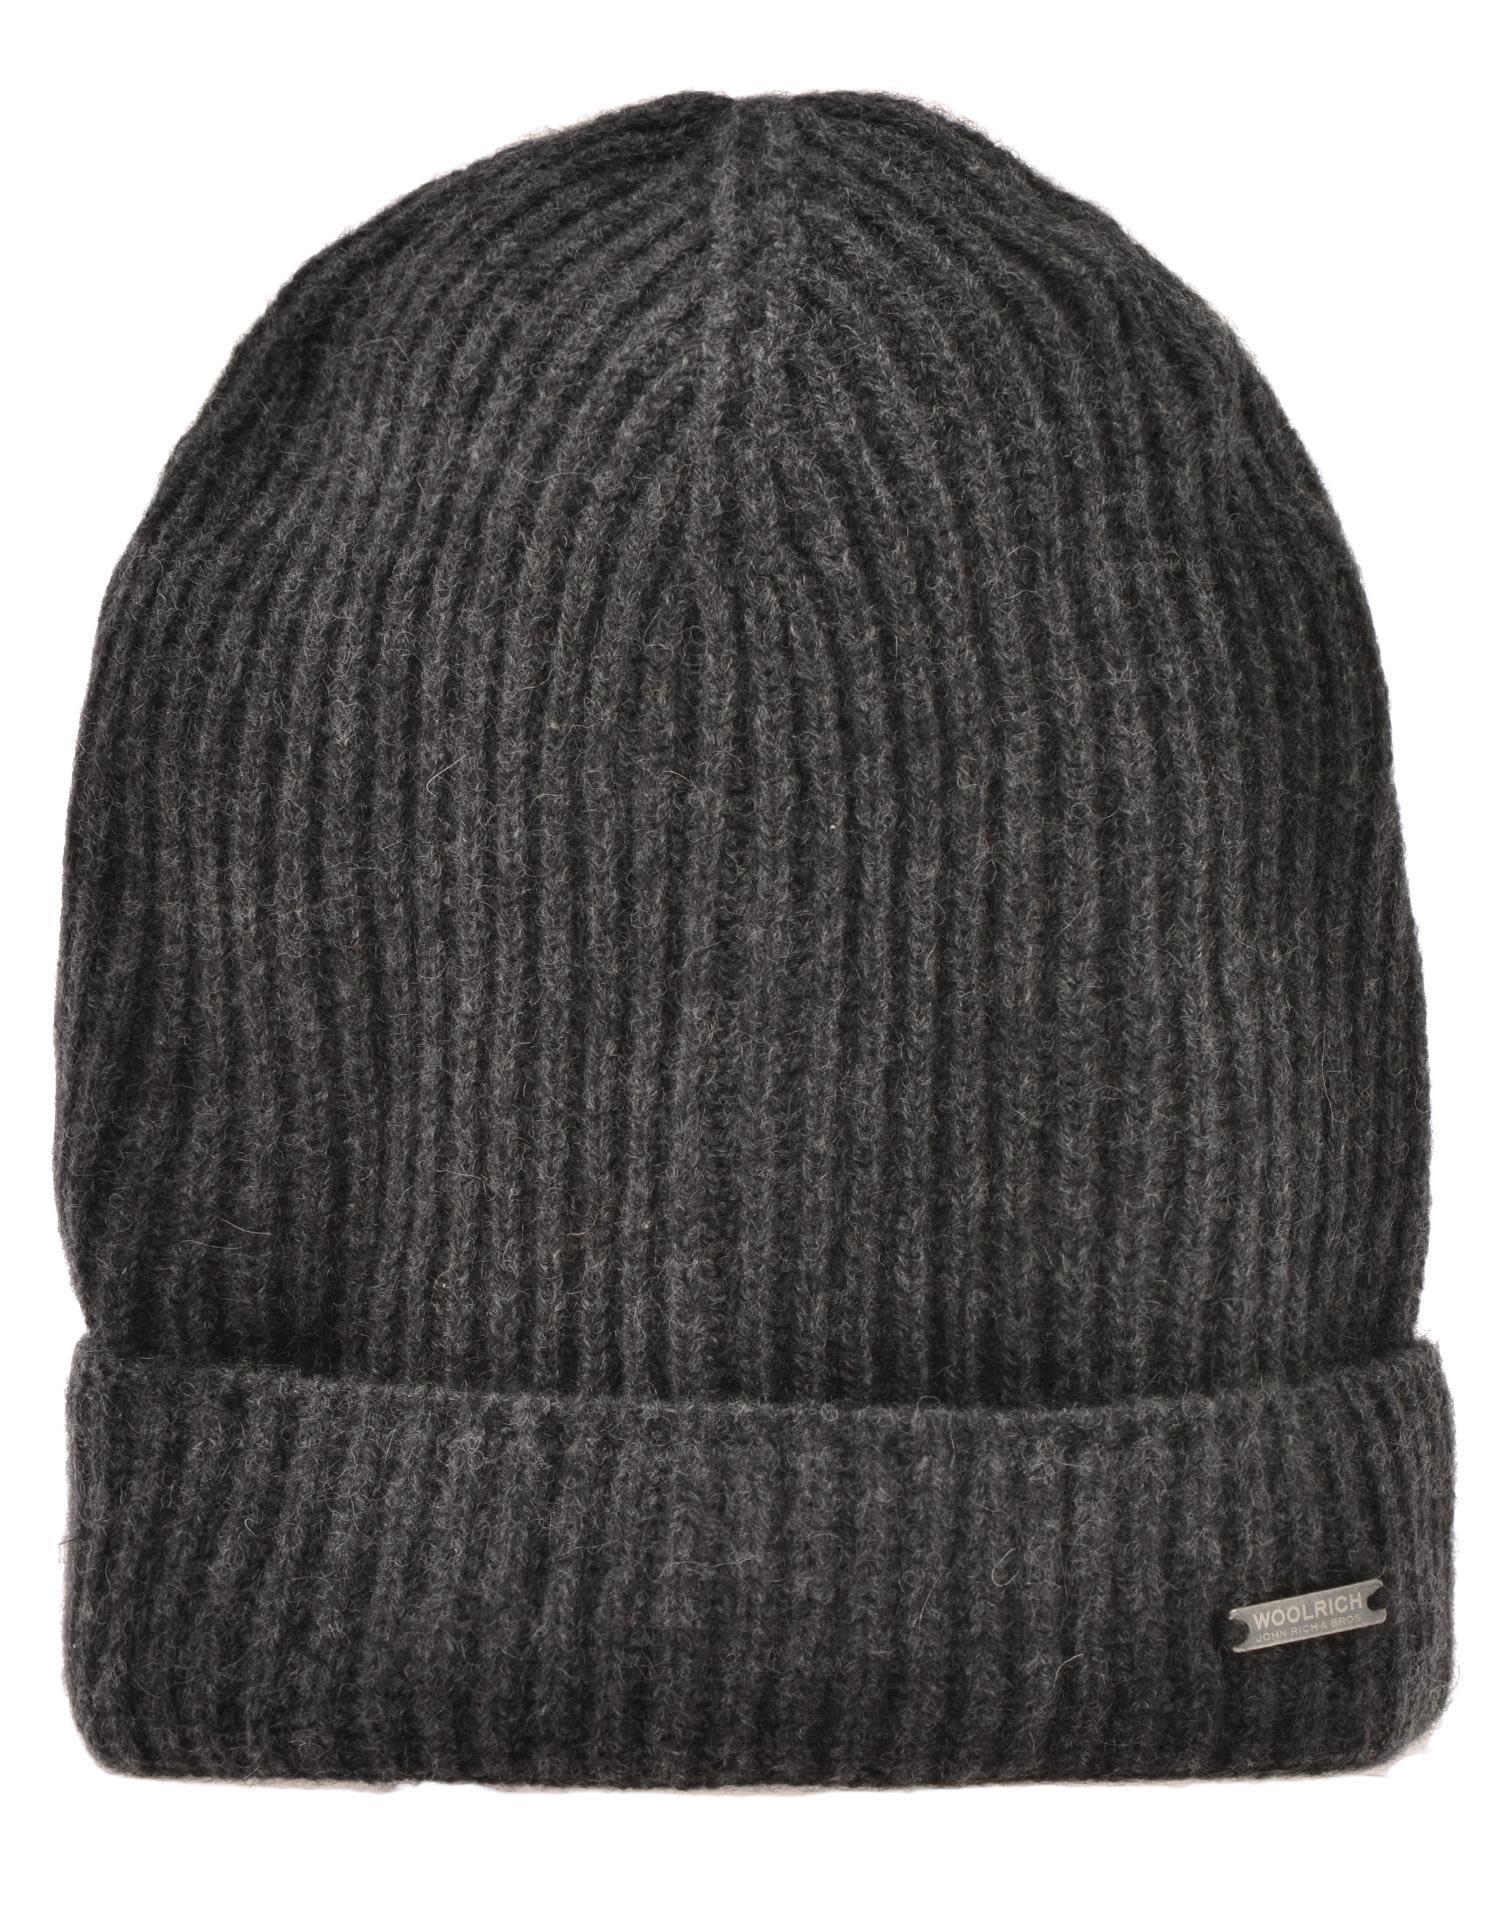 Woolrich Cashmere Beanie Hat In Grey  1b87d8f31b0